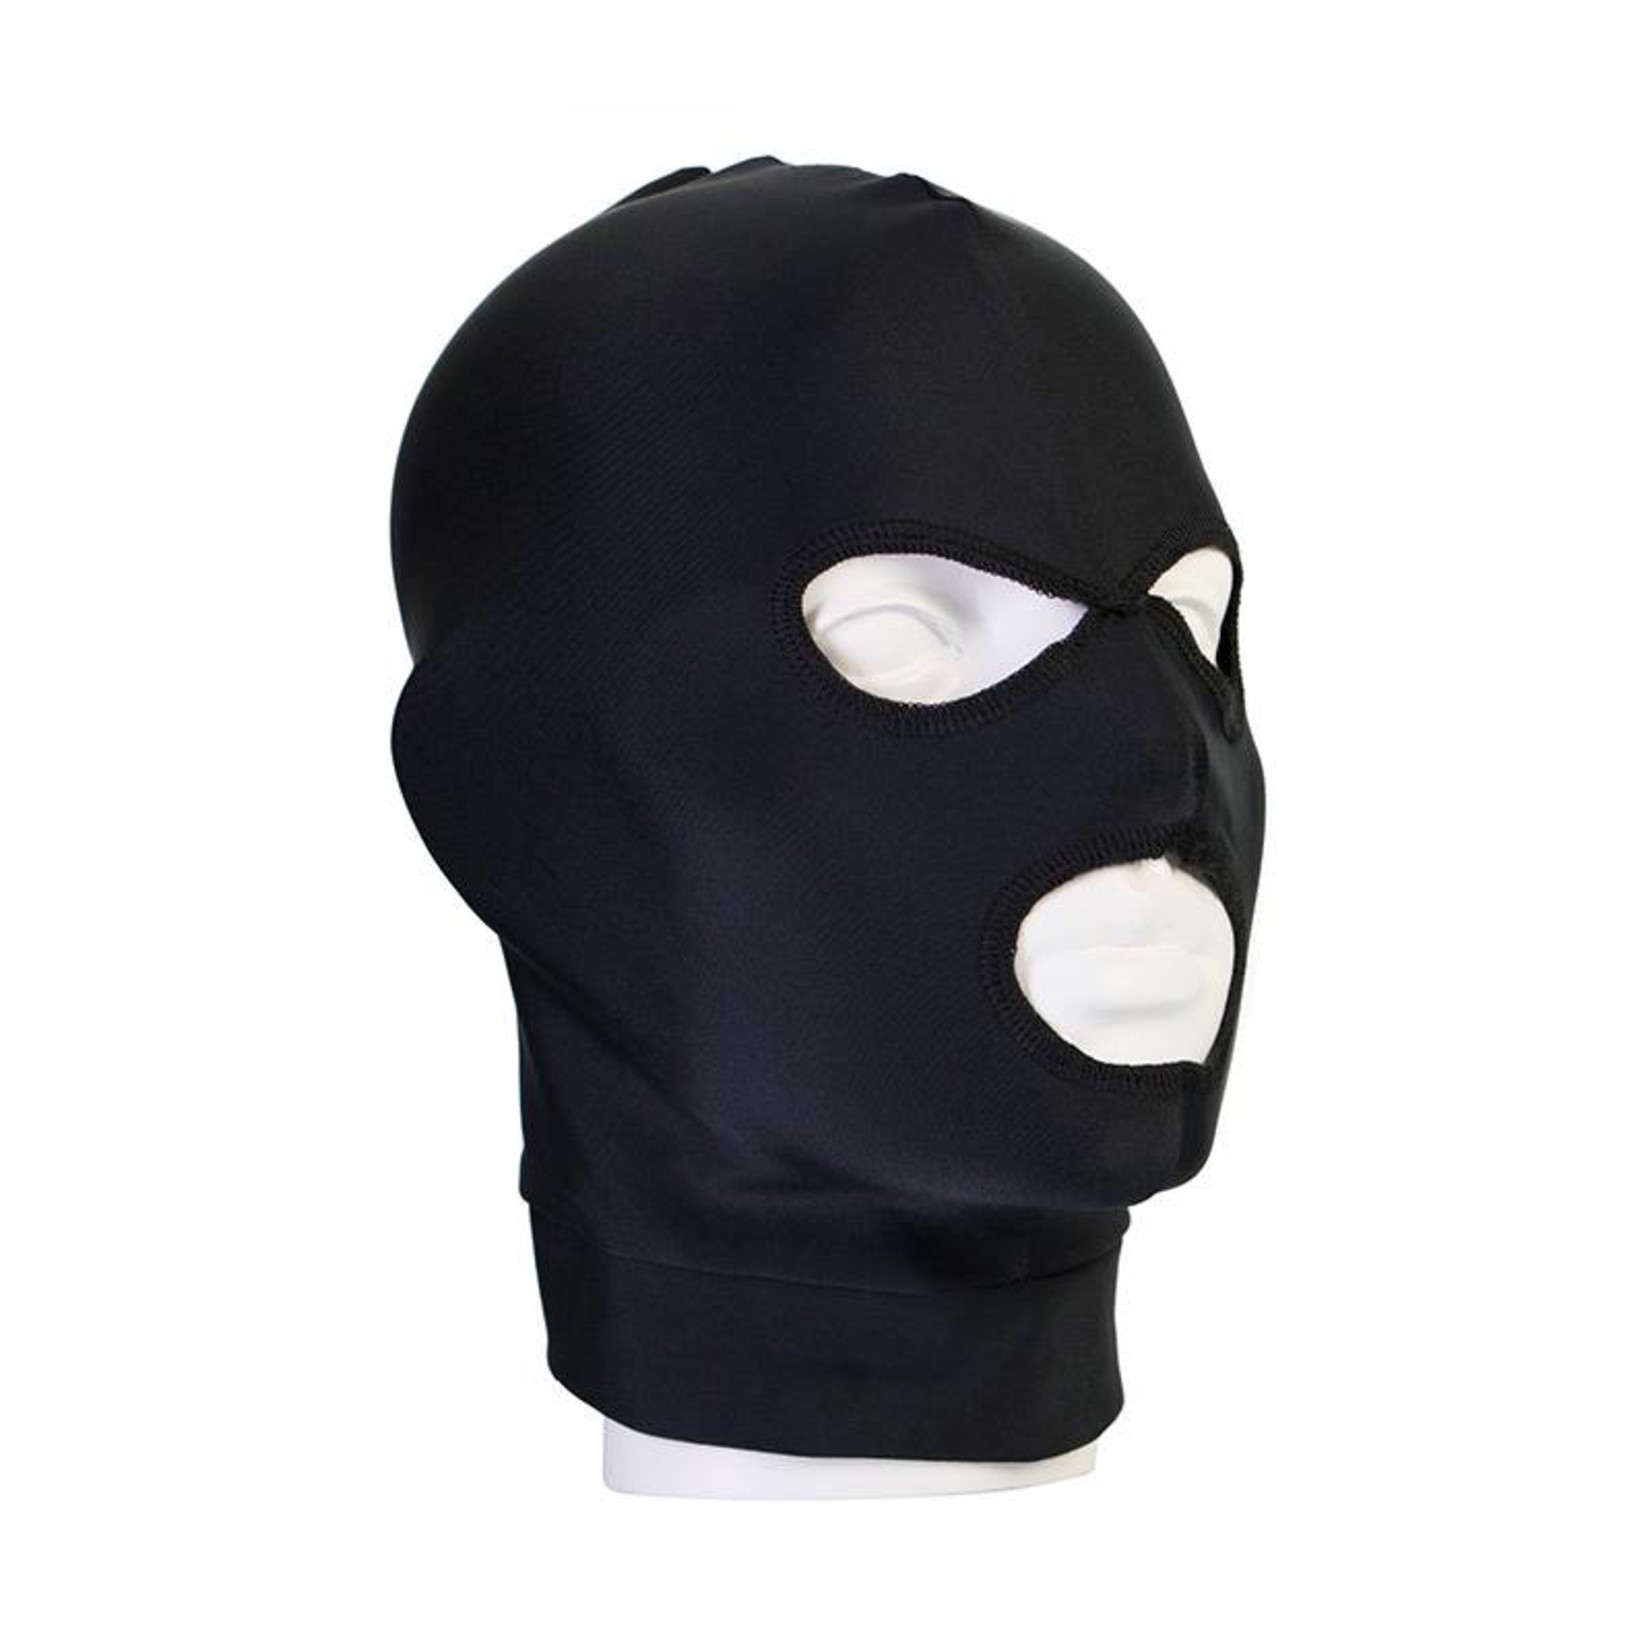 Other Mask - 3 hole hood